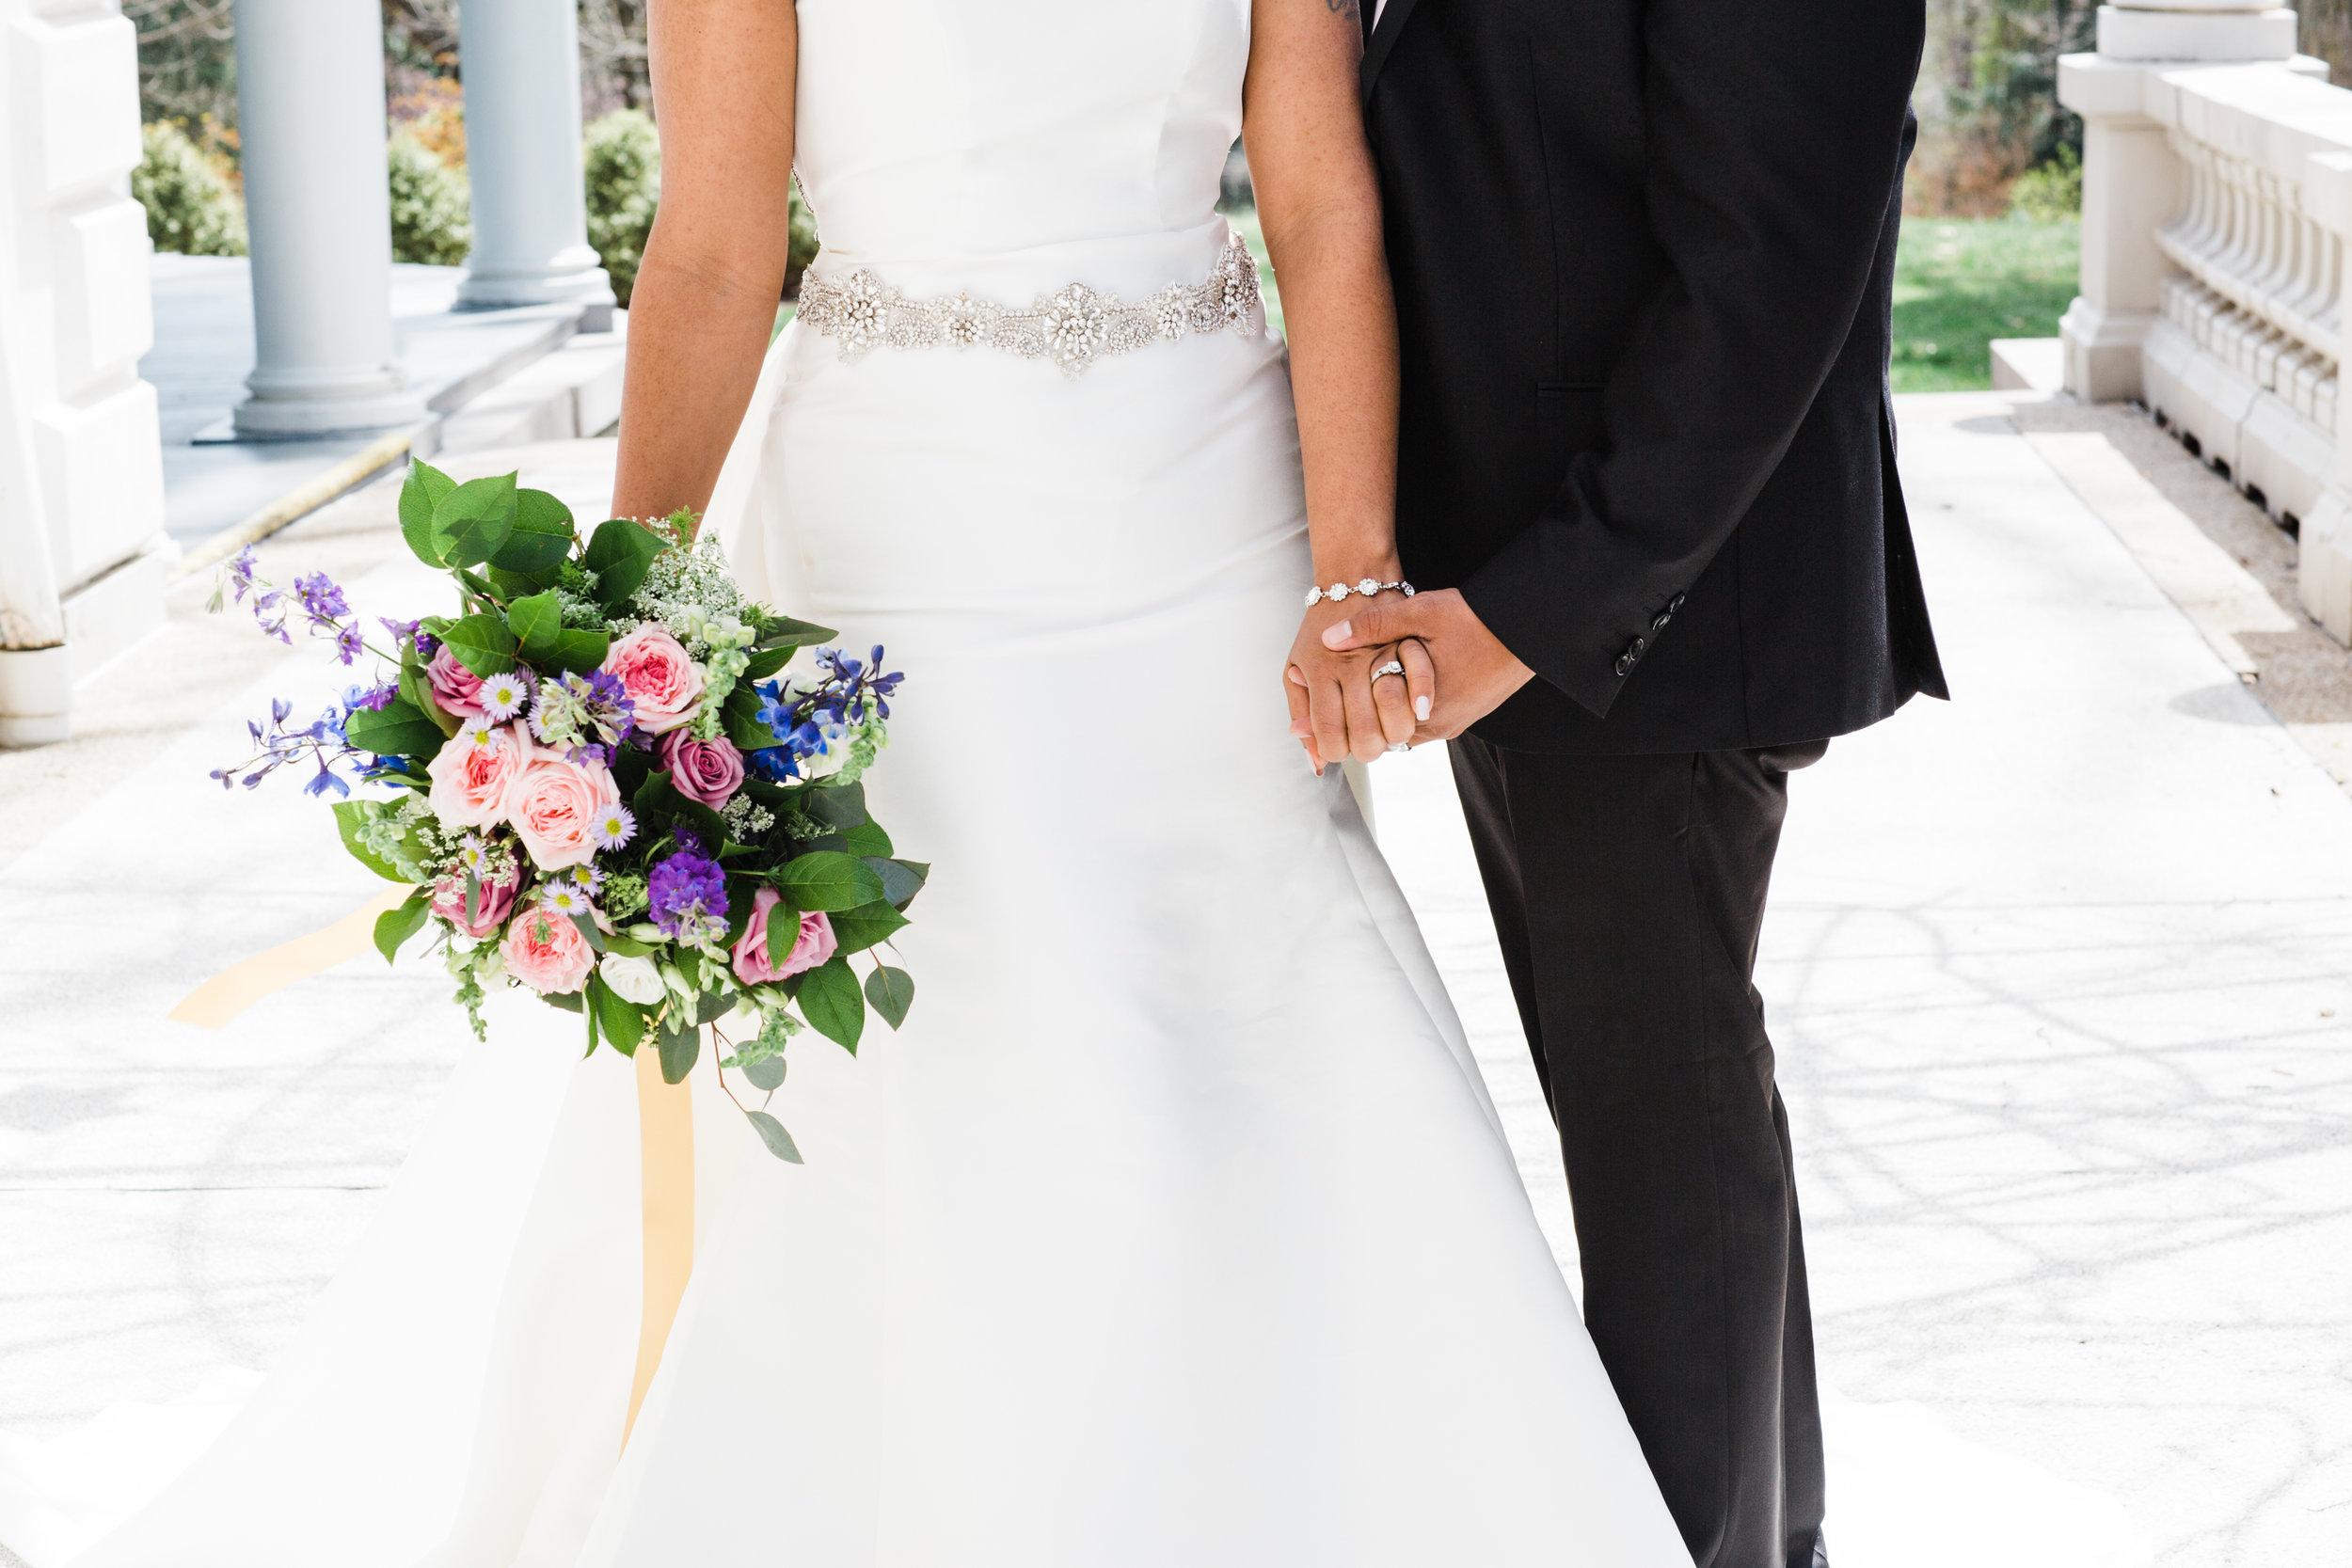 Best Bel Air Wedding Photography at Liriodendrum Mansion Megapixels Media.jpeg